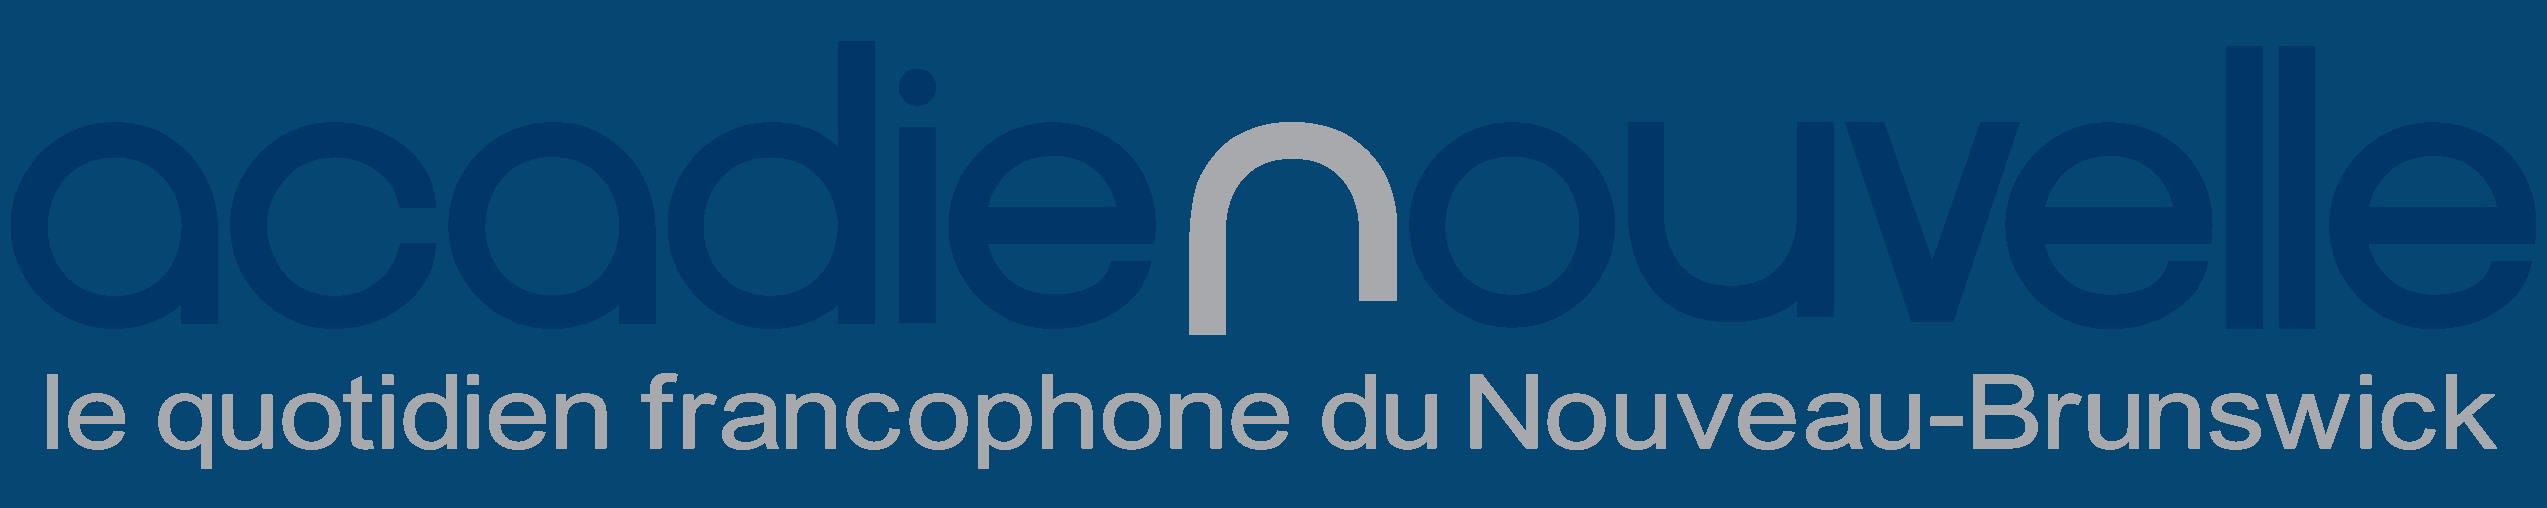 Acadie-Nouvelle